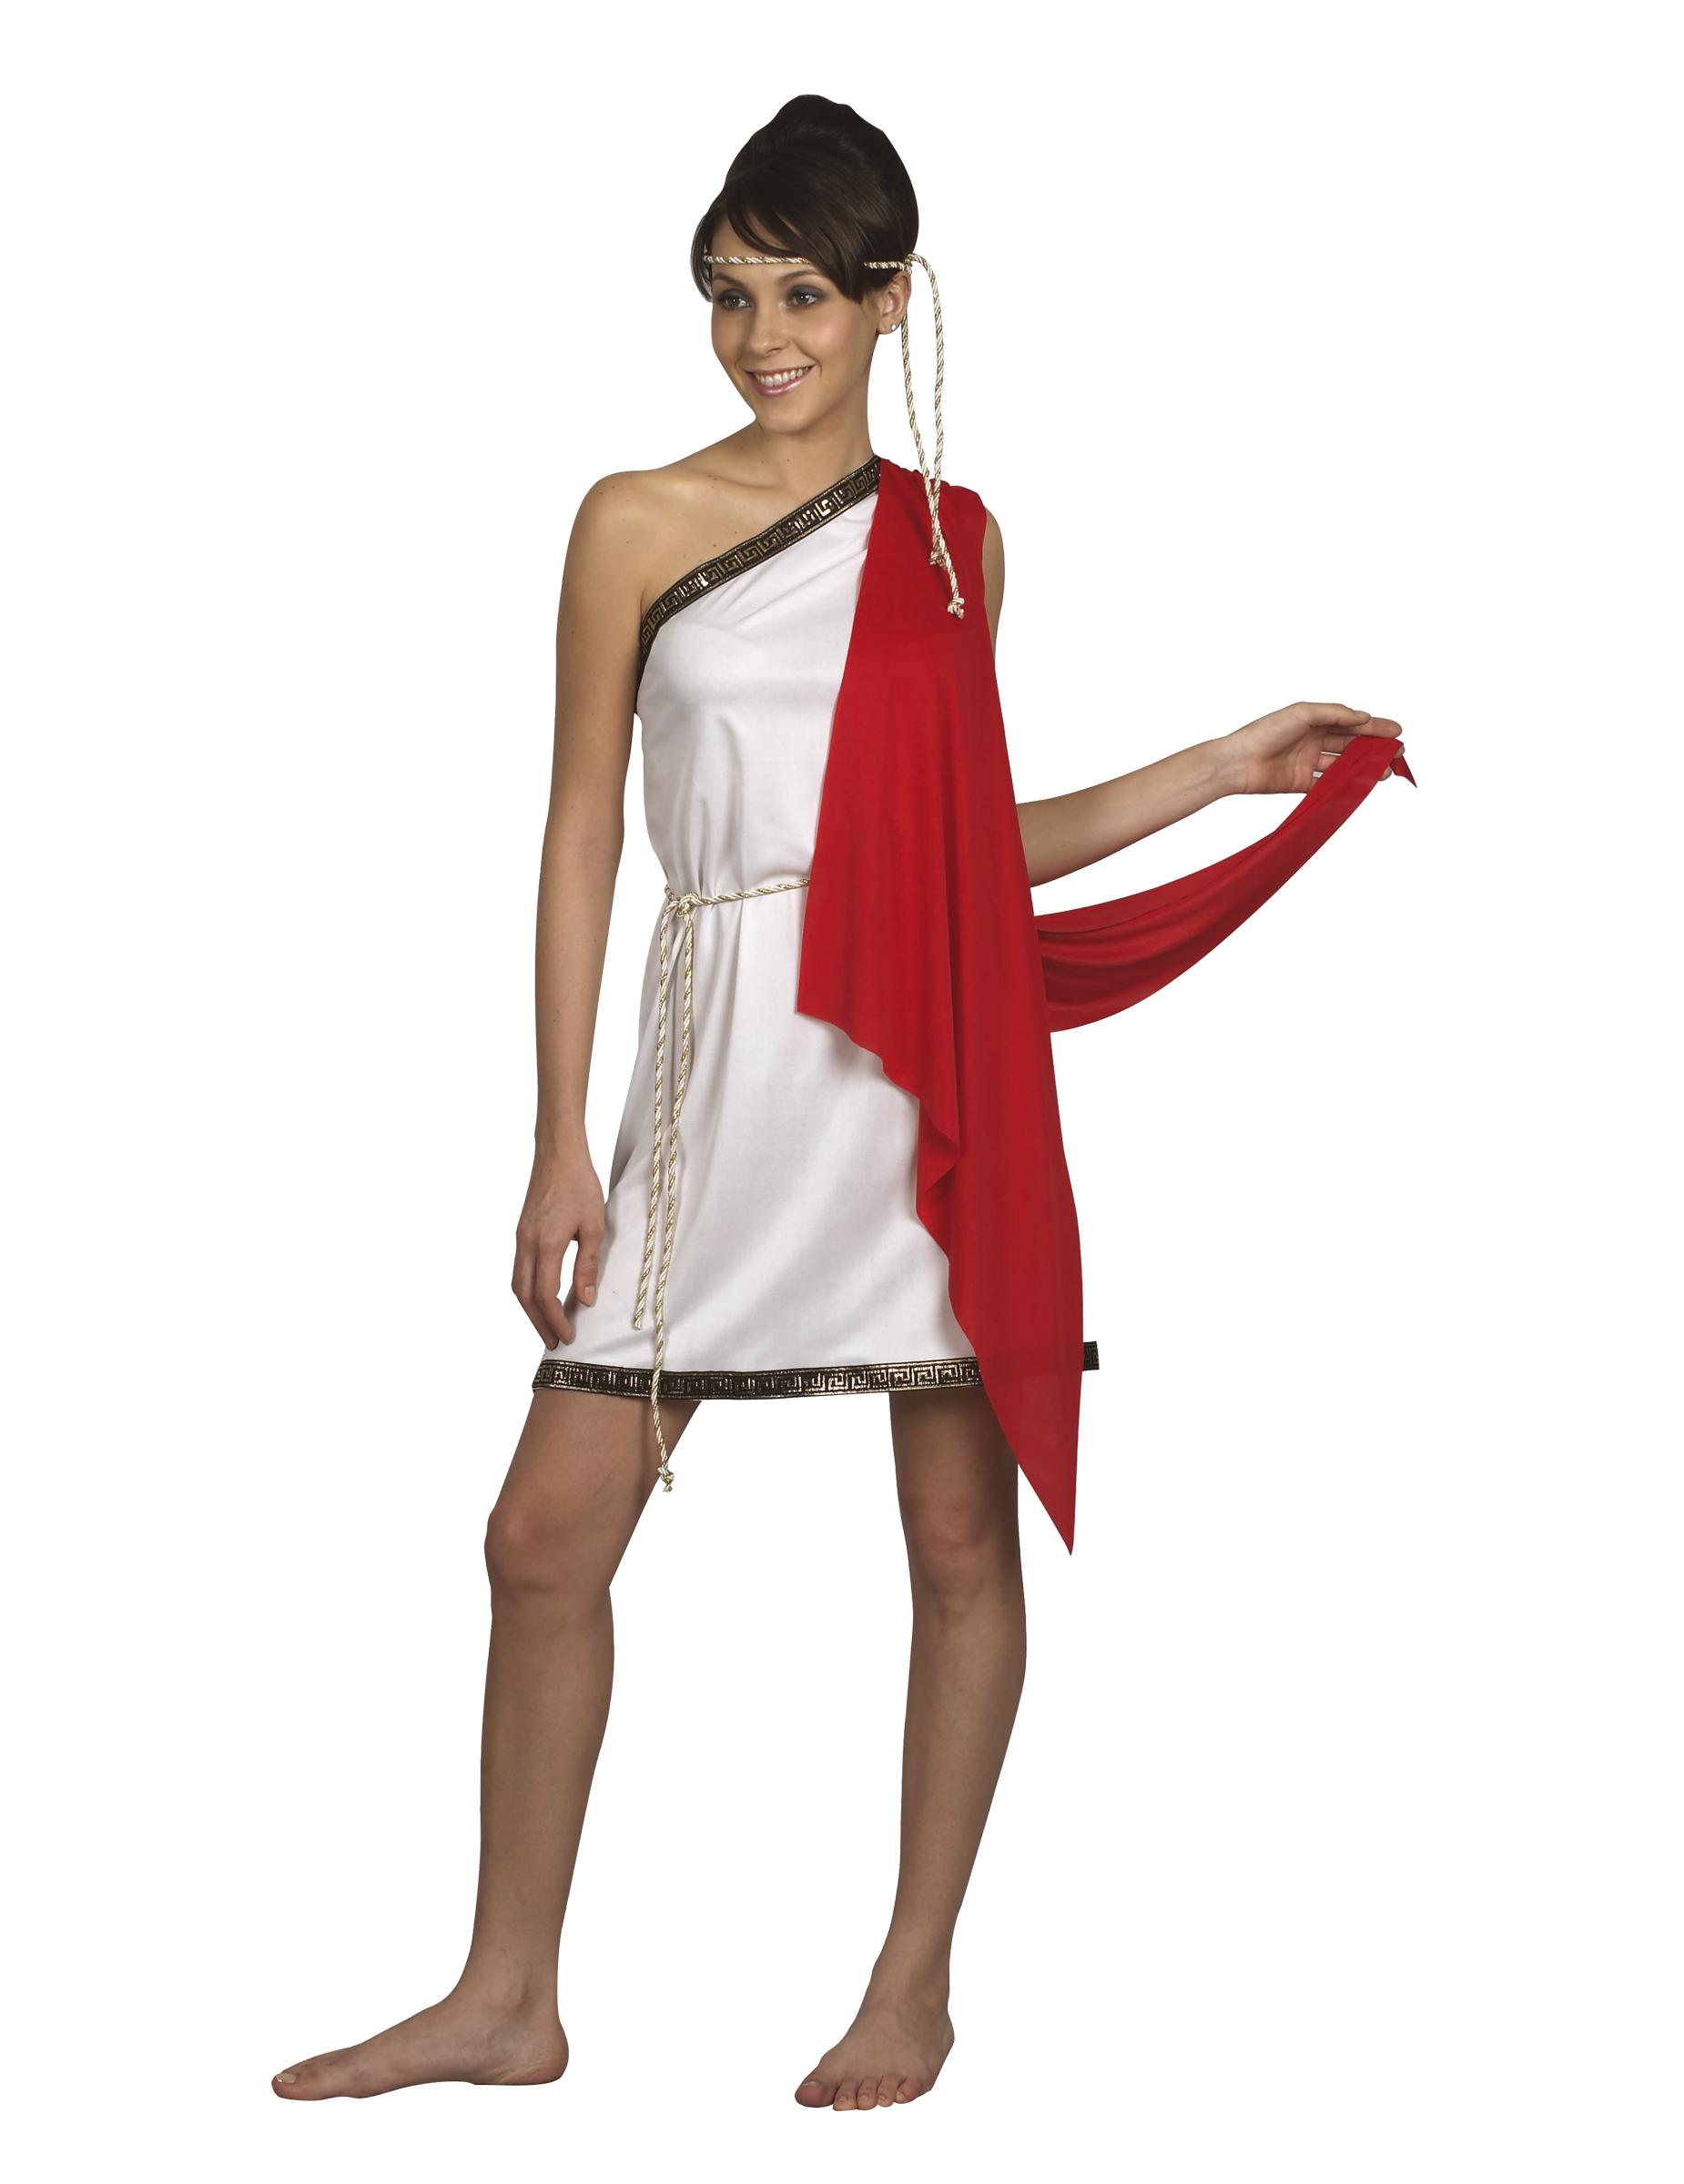 roman goddess costume for women. Black Bedroom Furniture Sets. Home Design Ideas